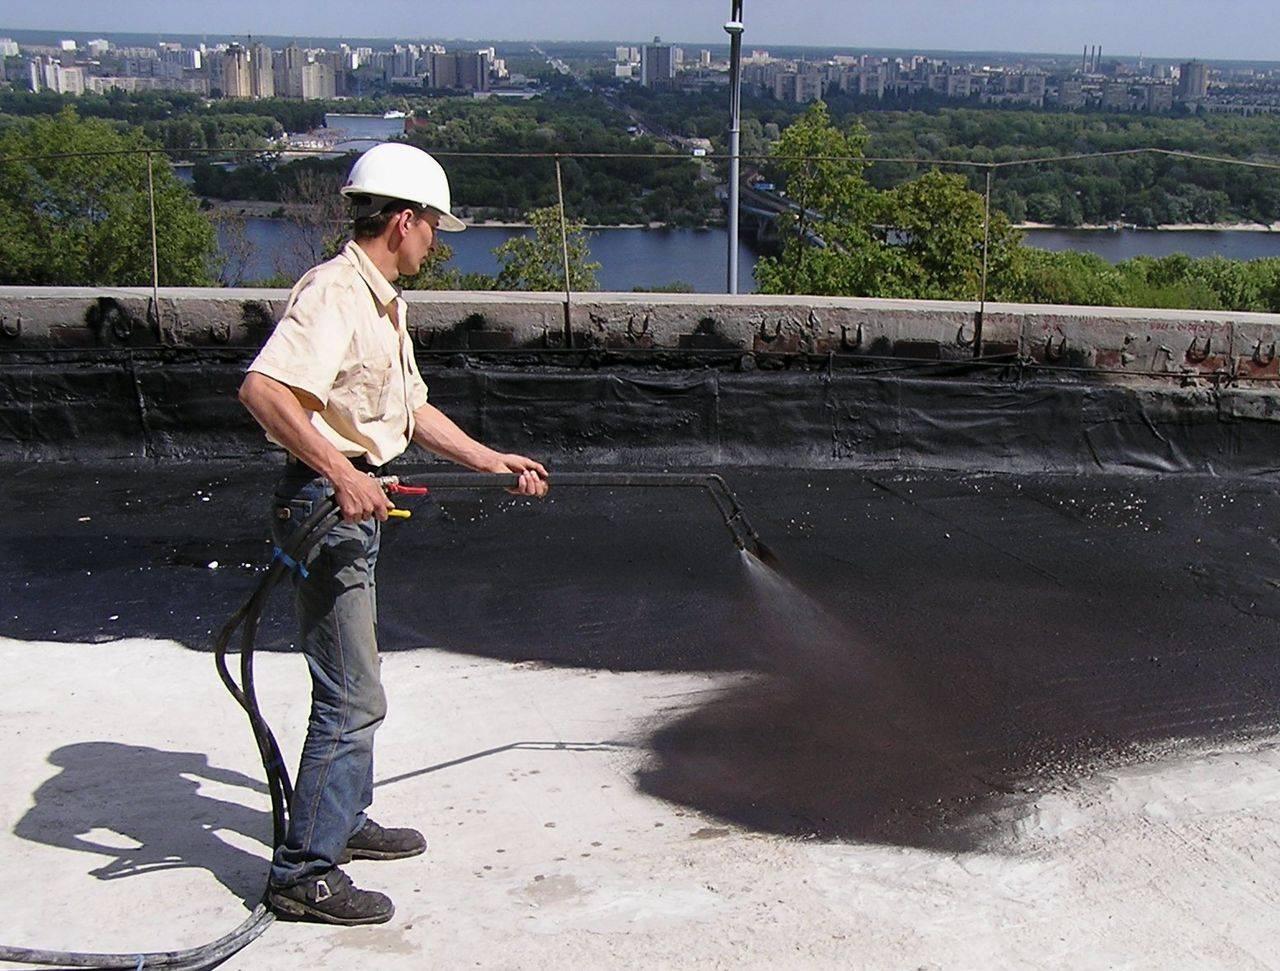 Норма расхода битума на 1 кв.м. поверхности для гидроизоляции